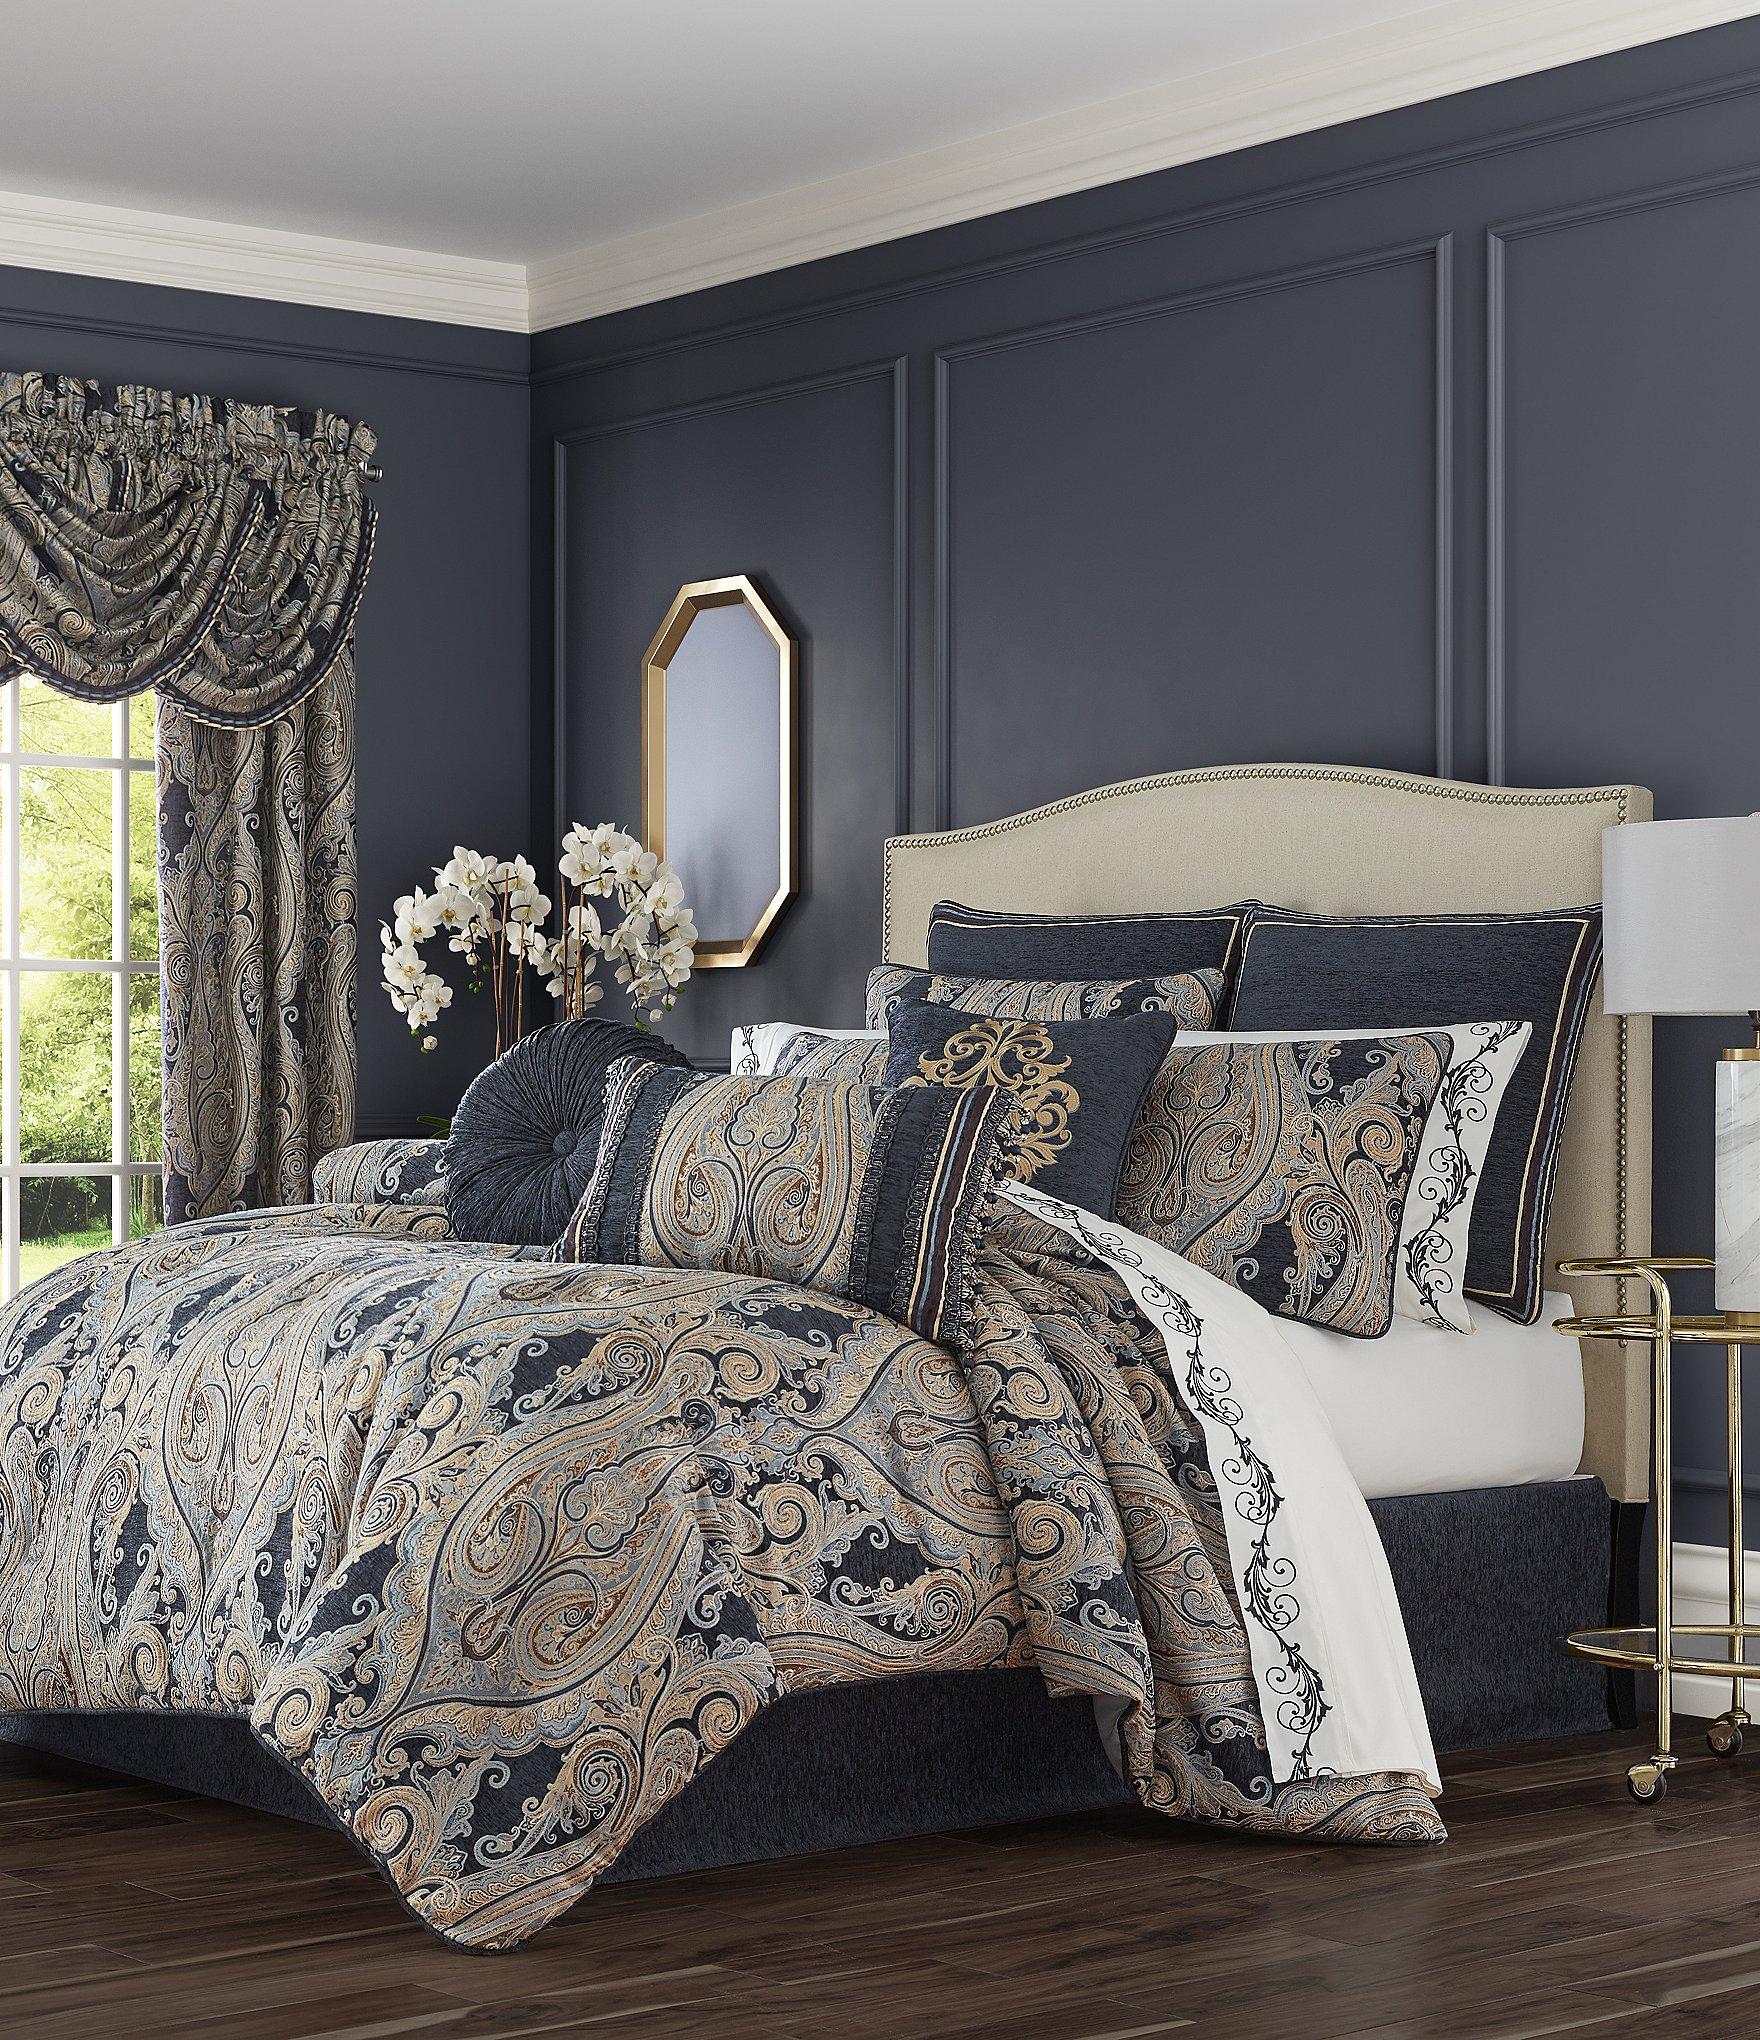 Queen Comforter Sets Bedding Bedding Collections Dillard S